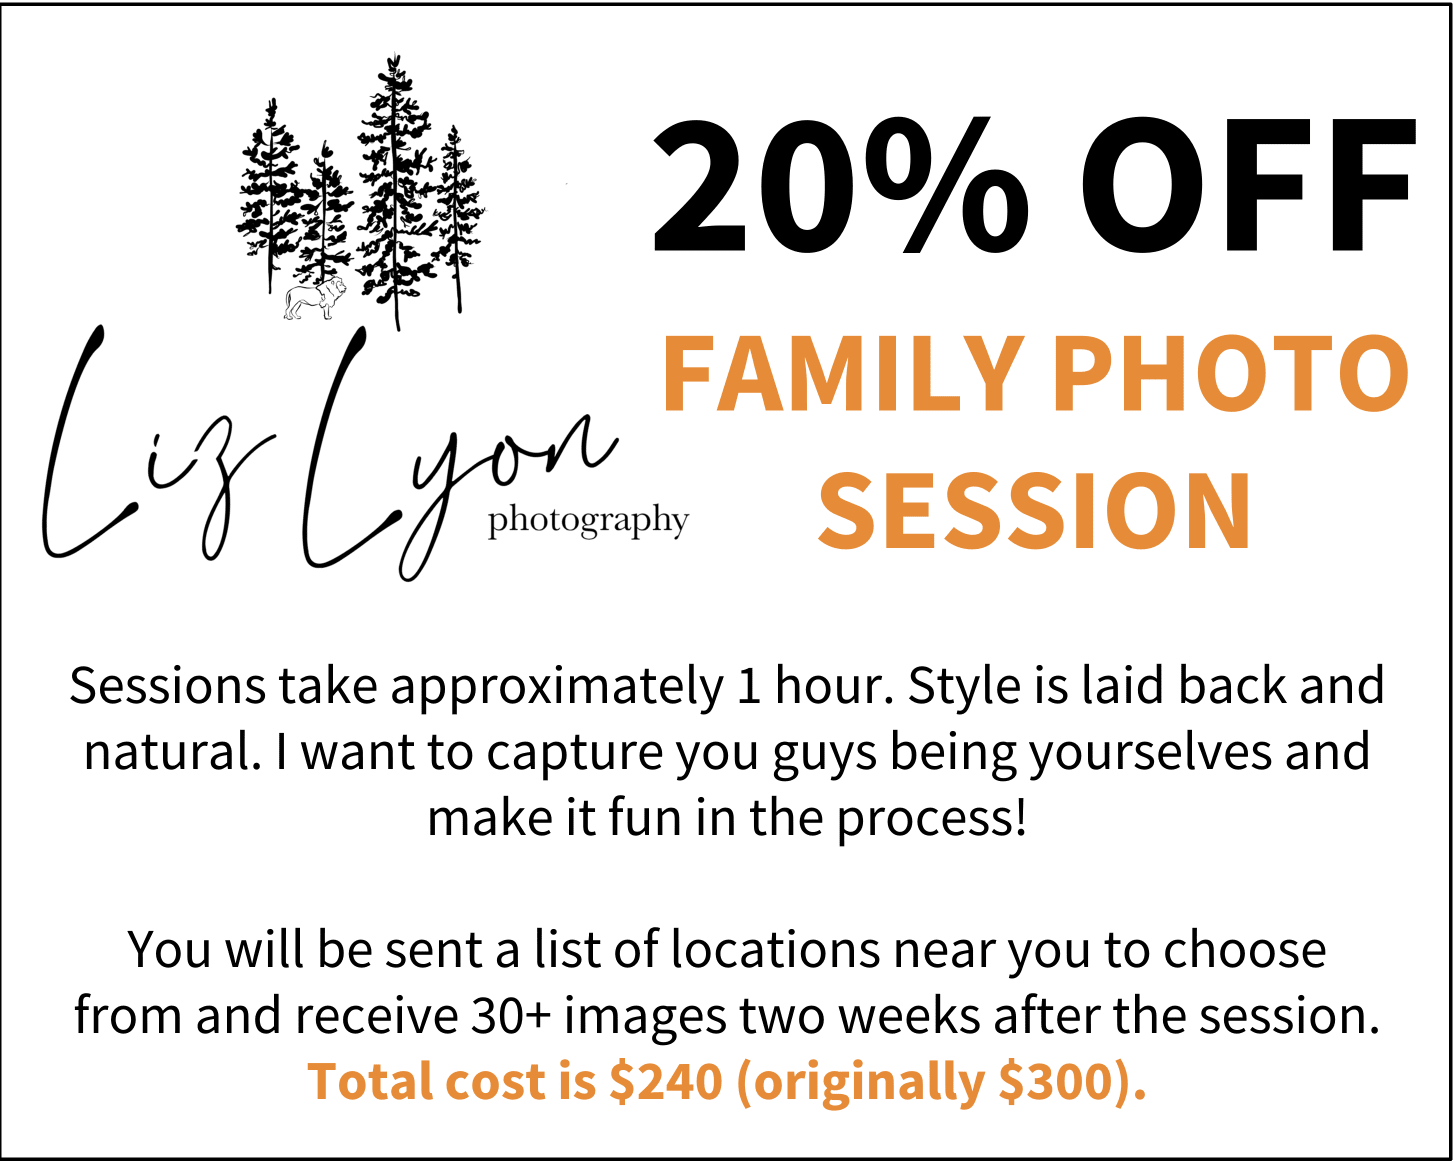 Liz Lyon Photography Discount